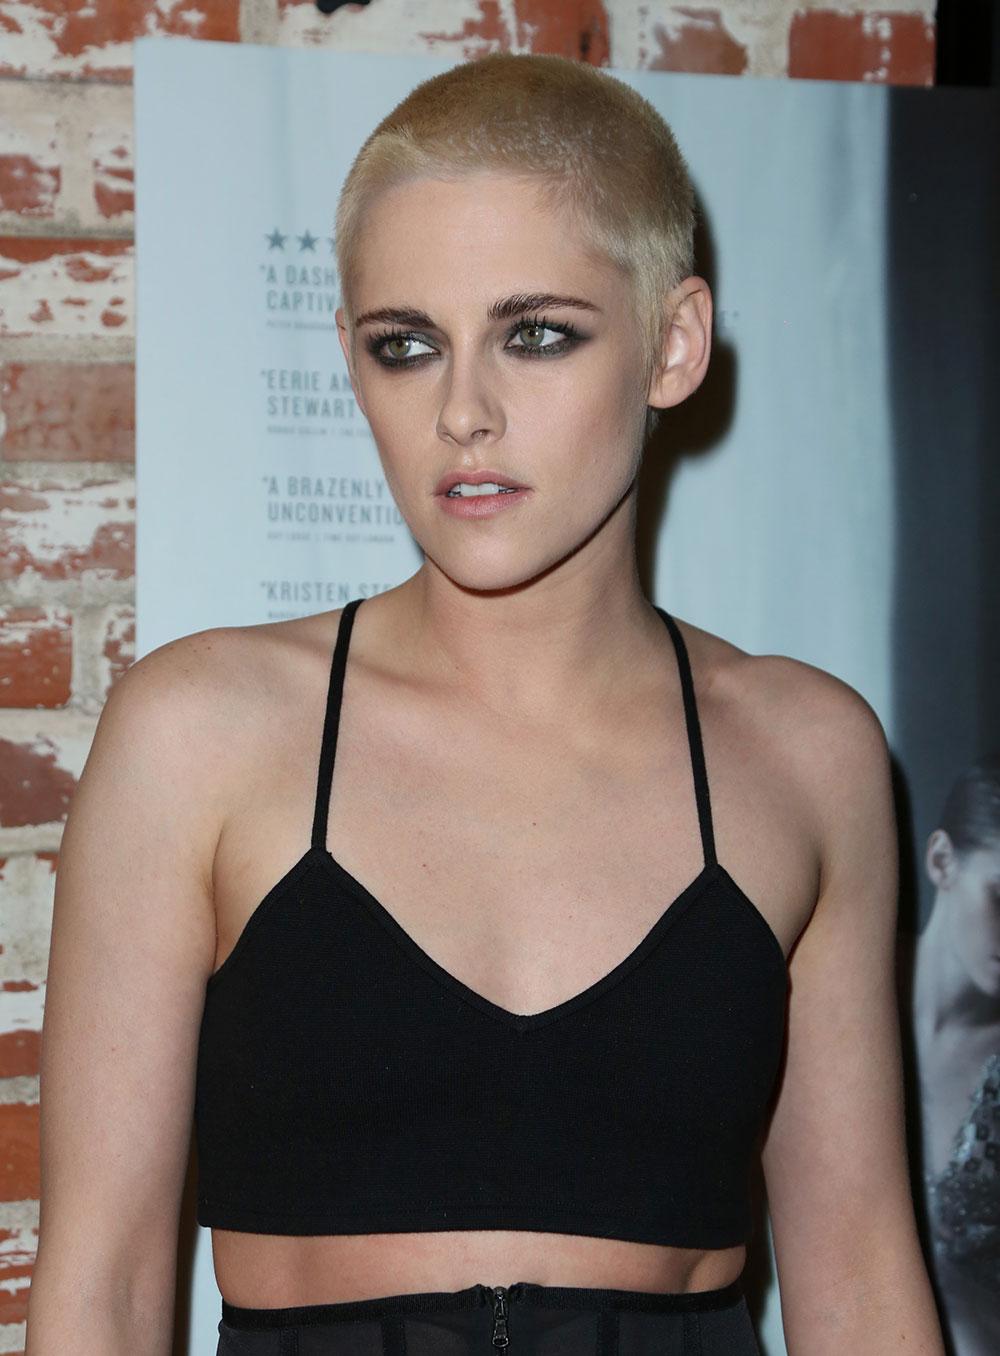 Kristen Stewart Shows Off New Buzzcut Hair 'Do At Premiere